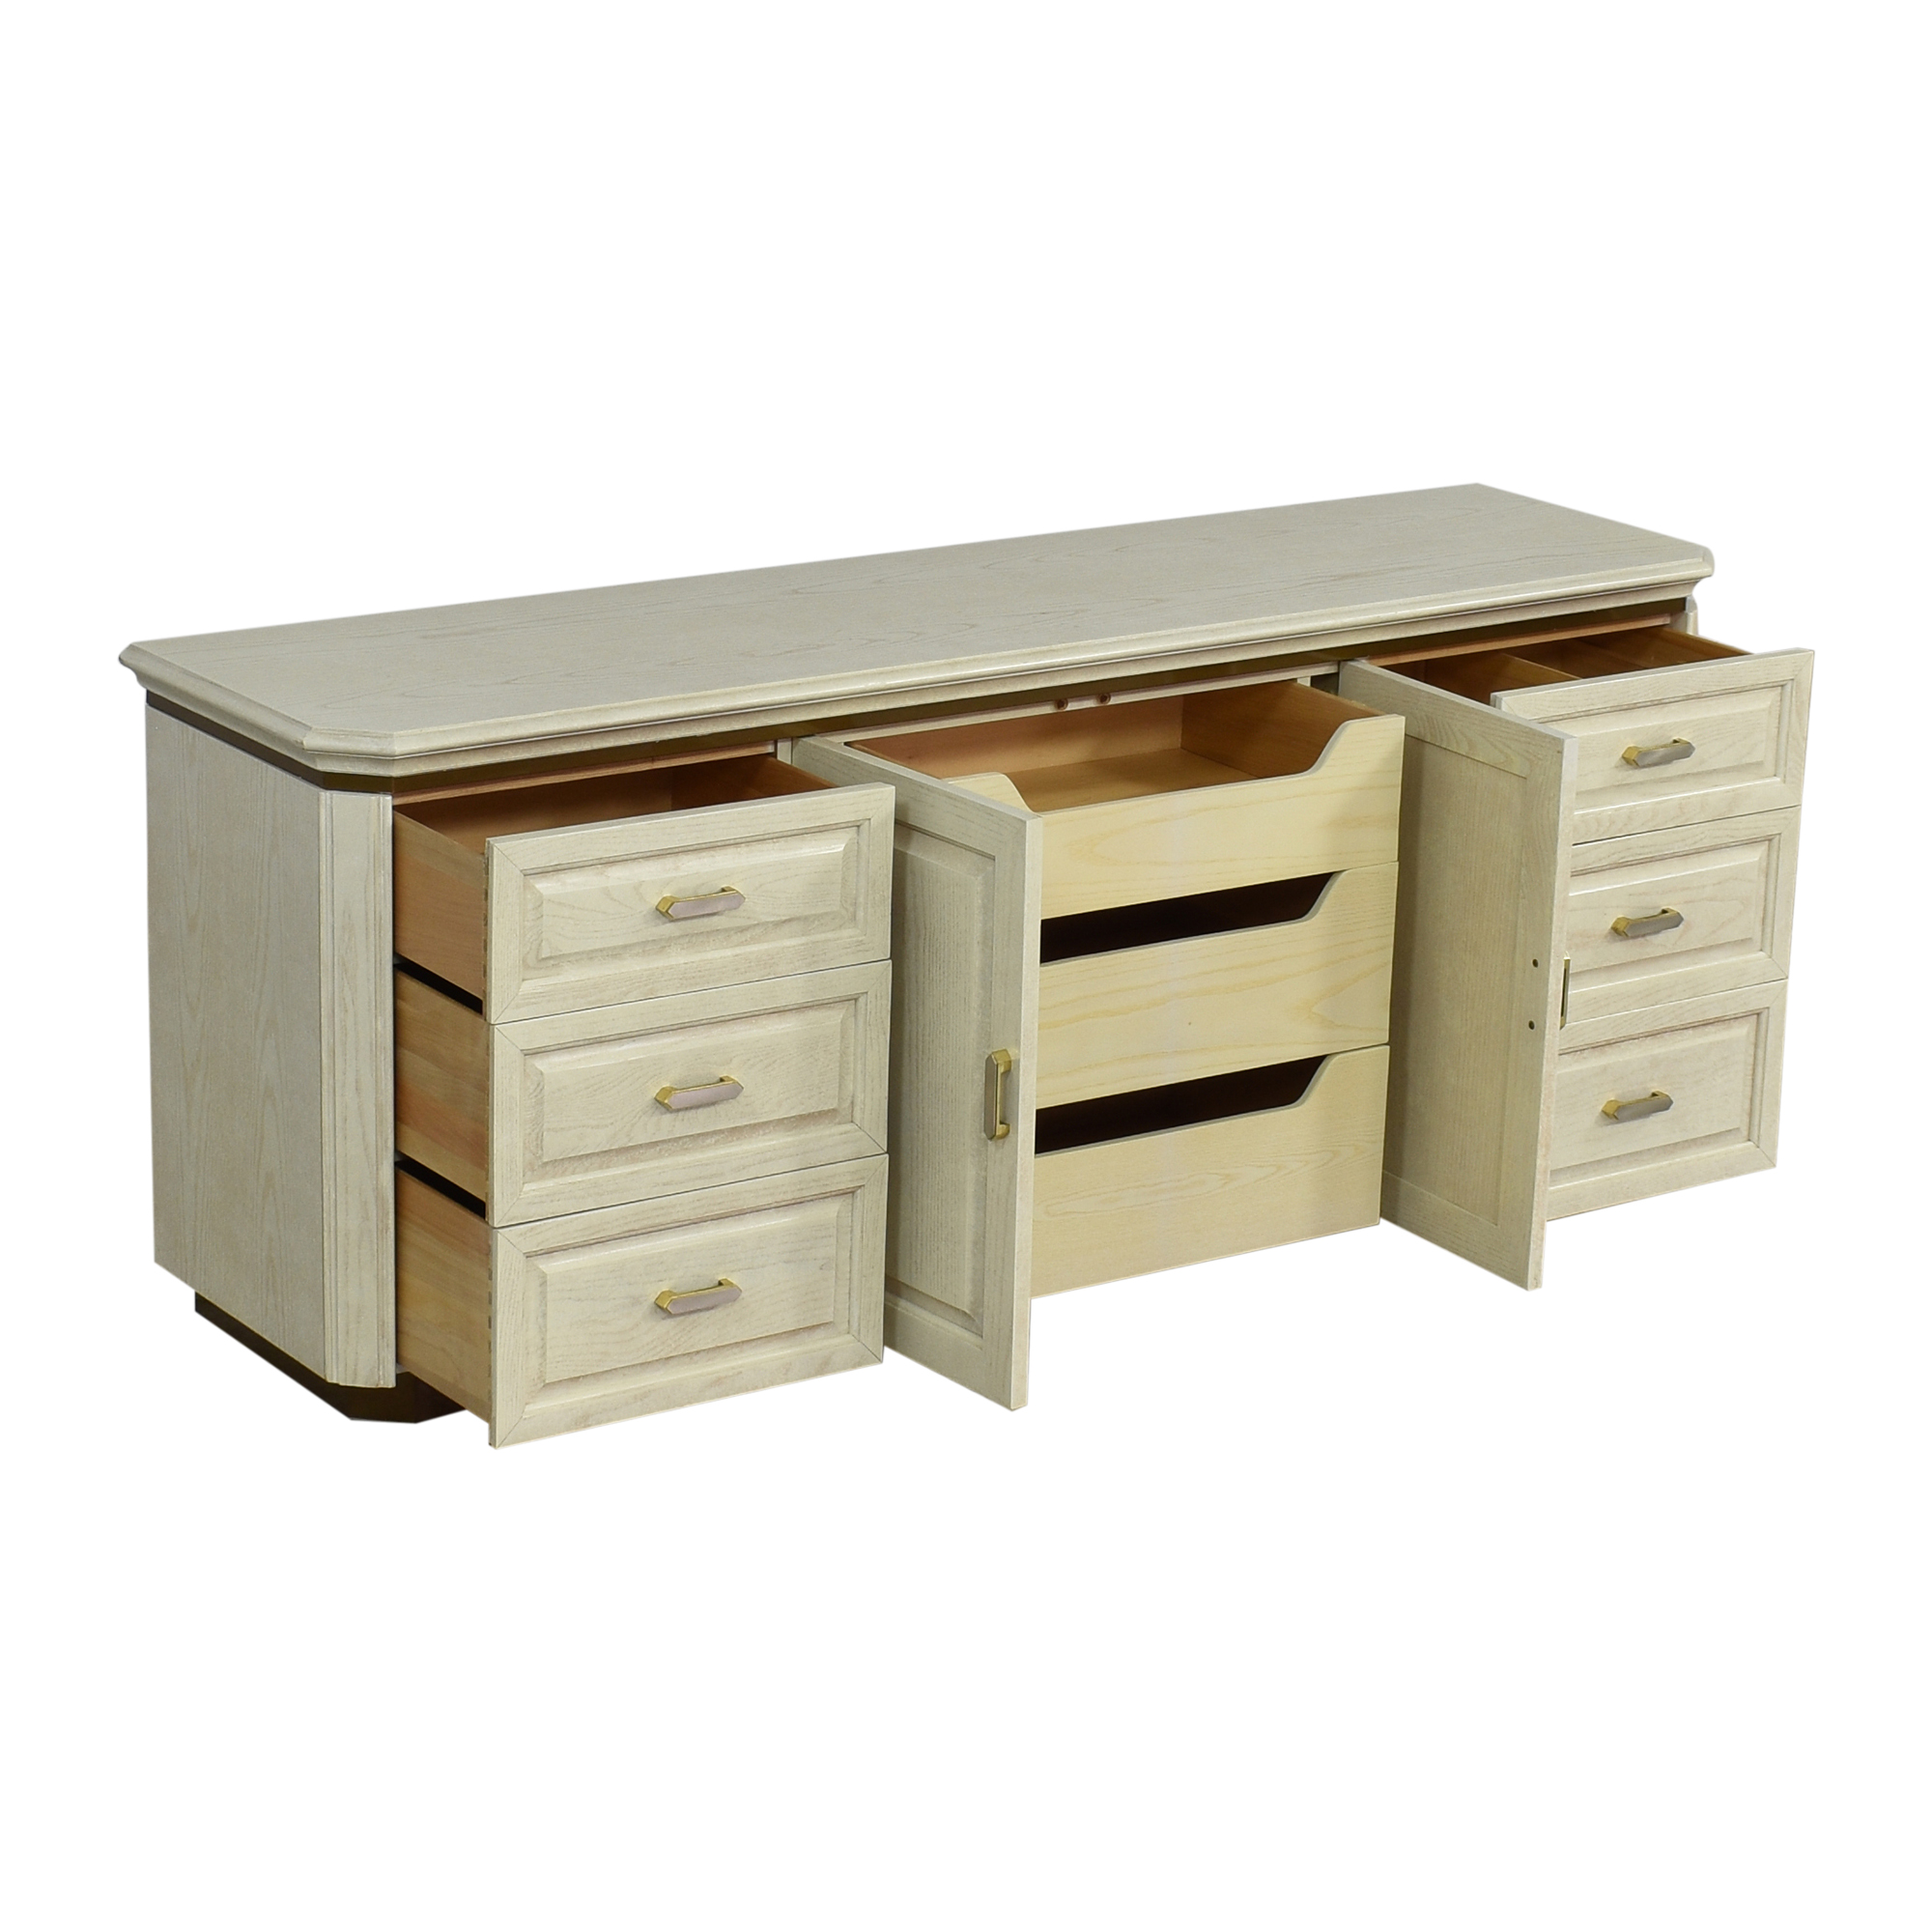 Henredon Furniture Henredon Charisma Triple Dresser Storage